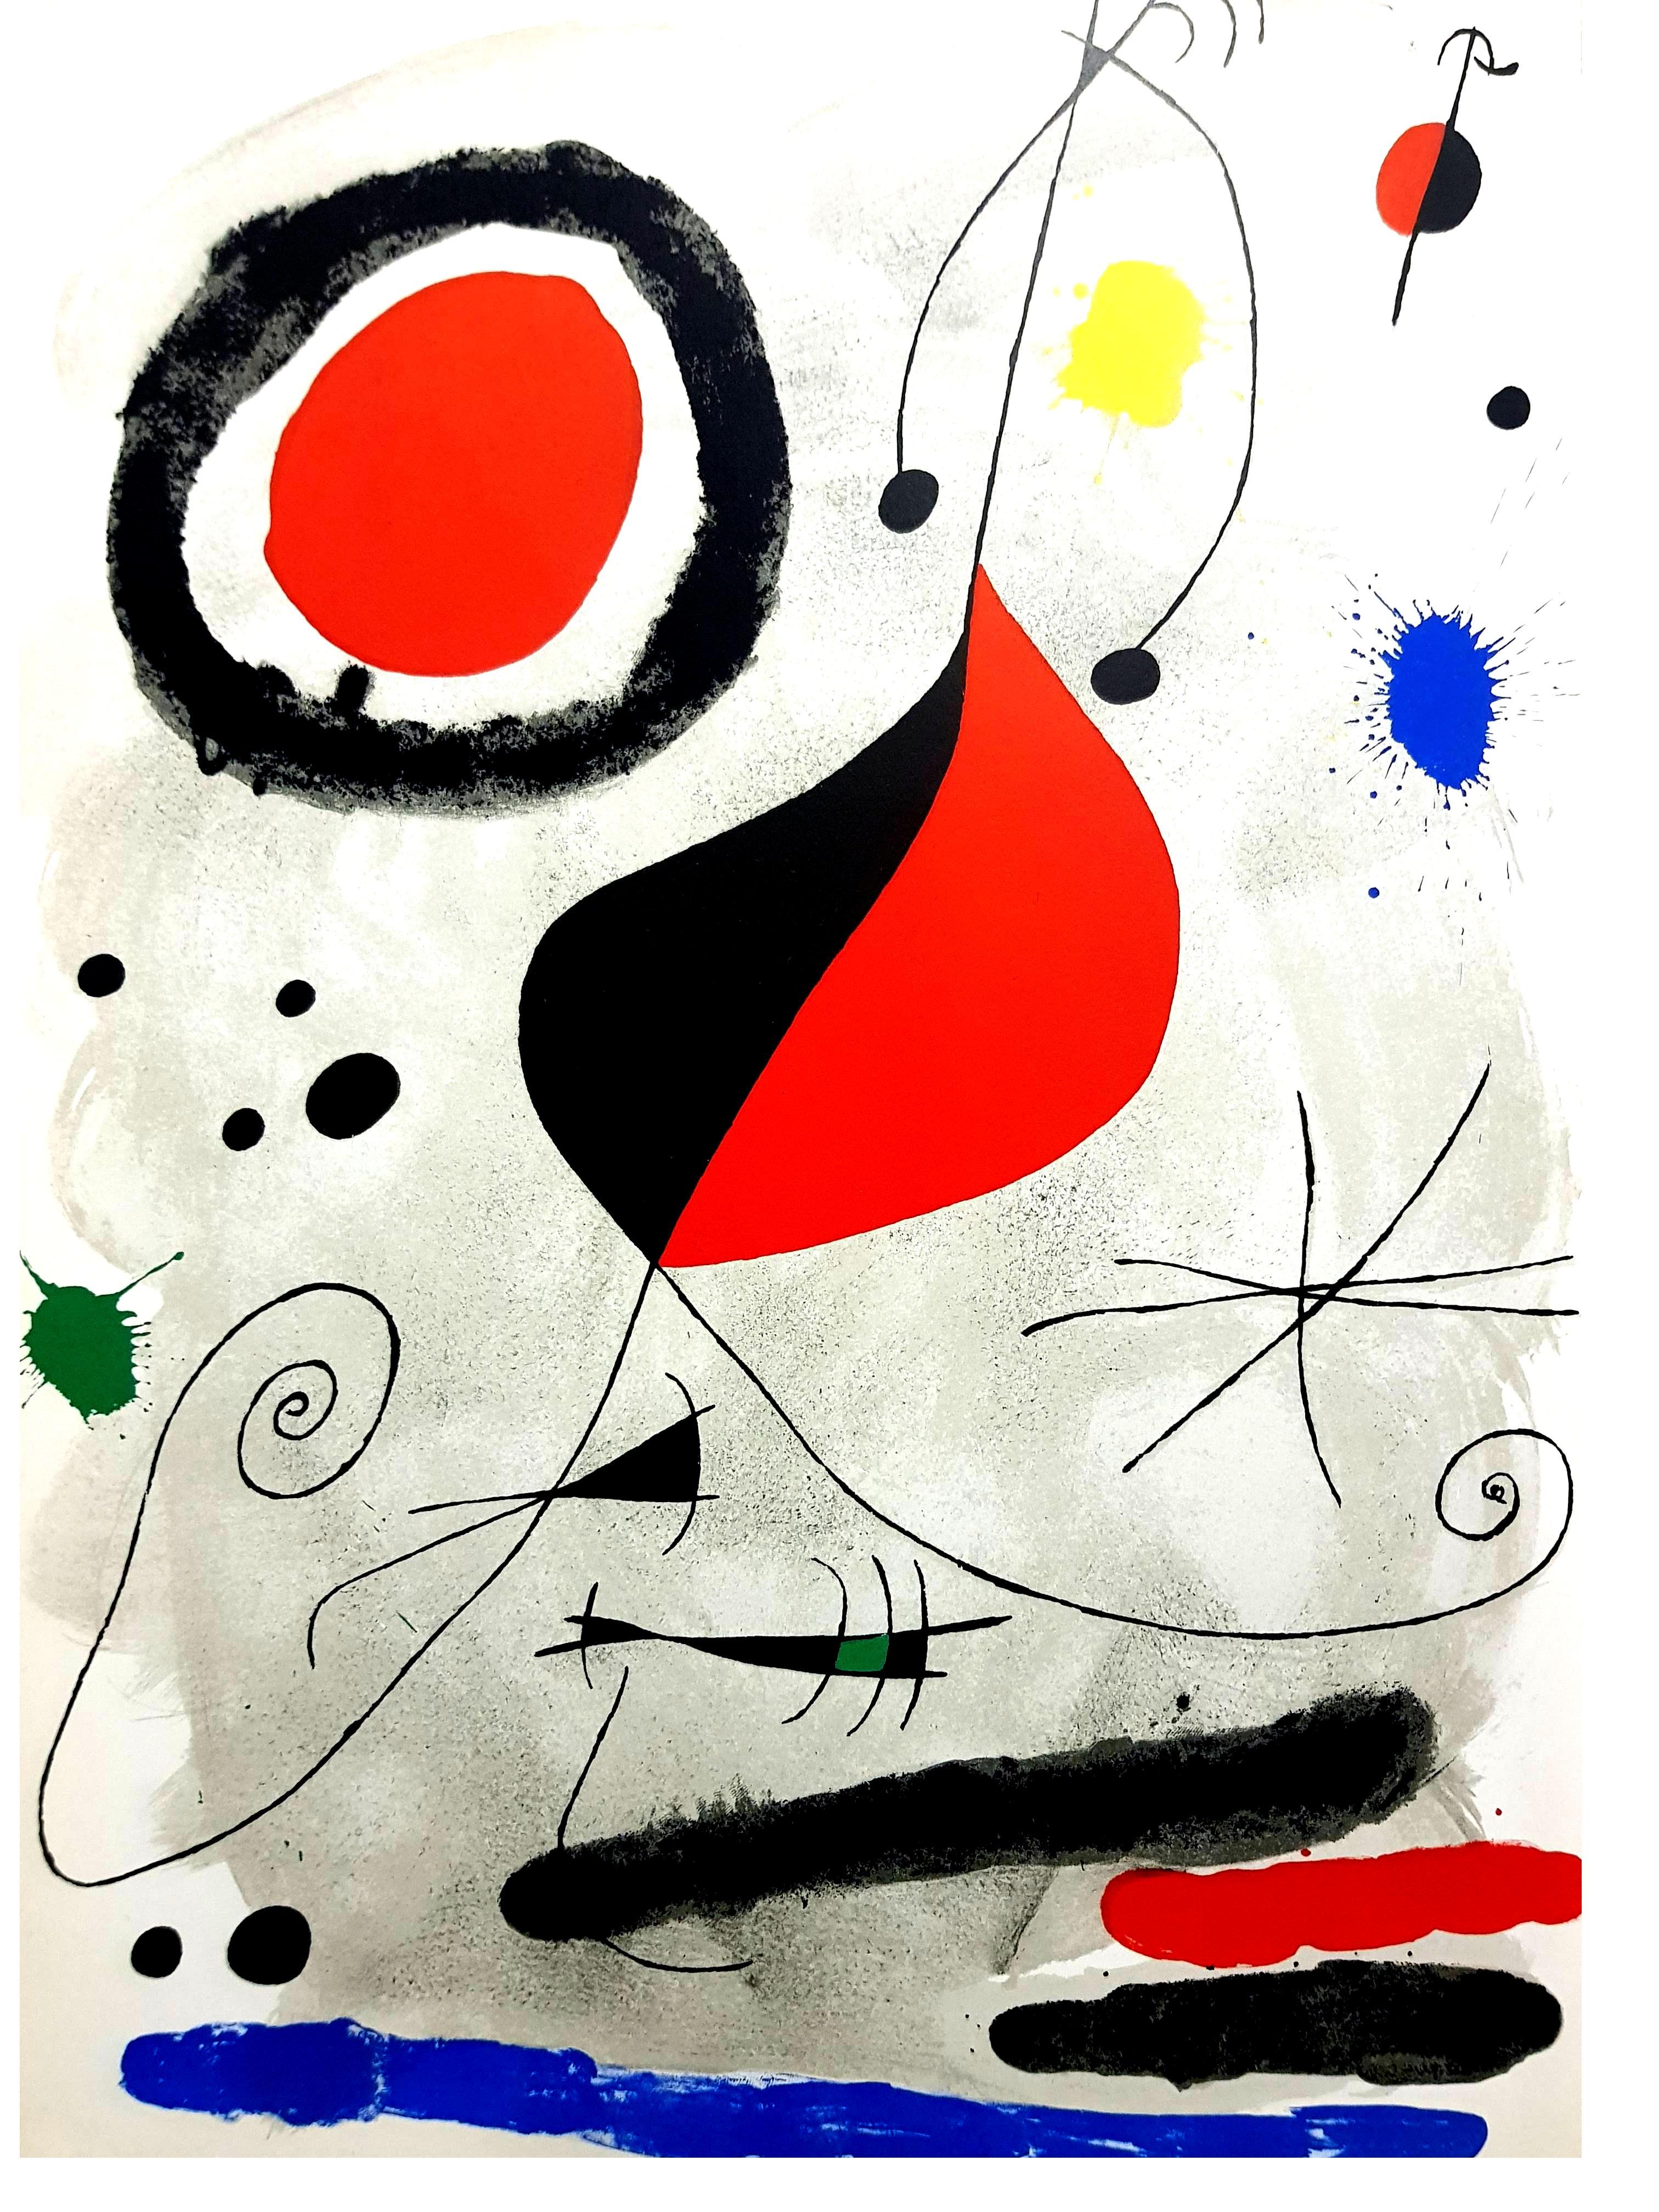 Joan Miro -  Original Lithograph from Derriere le Miroir